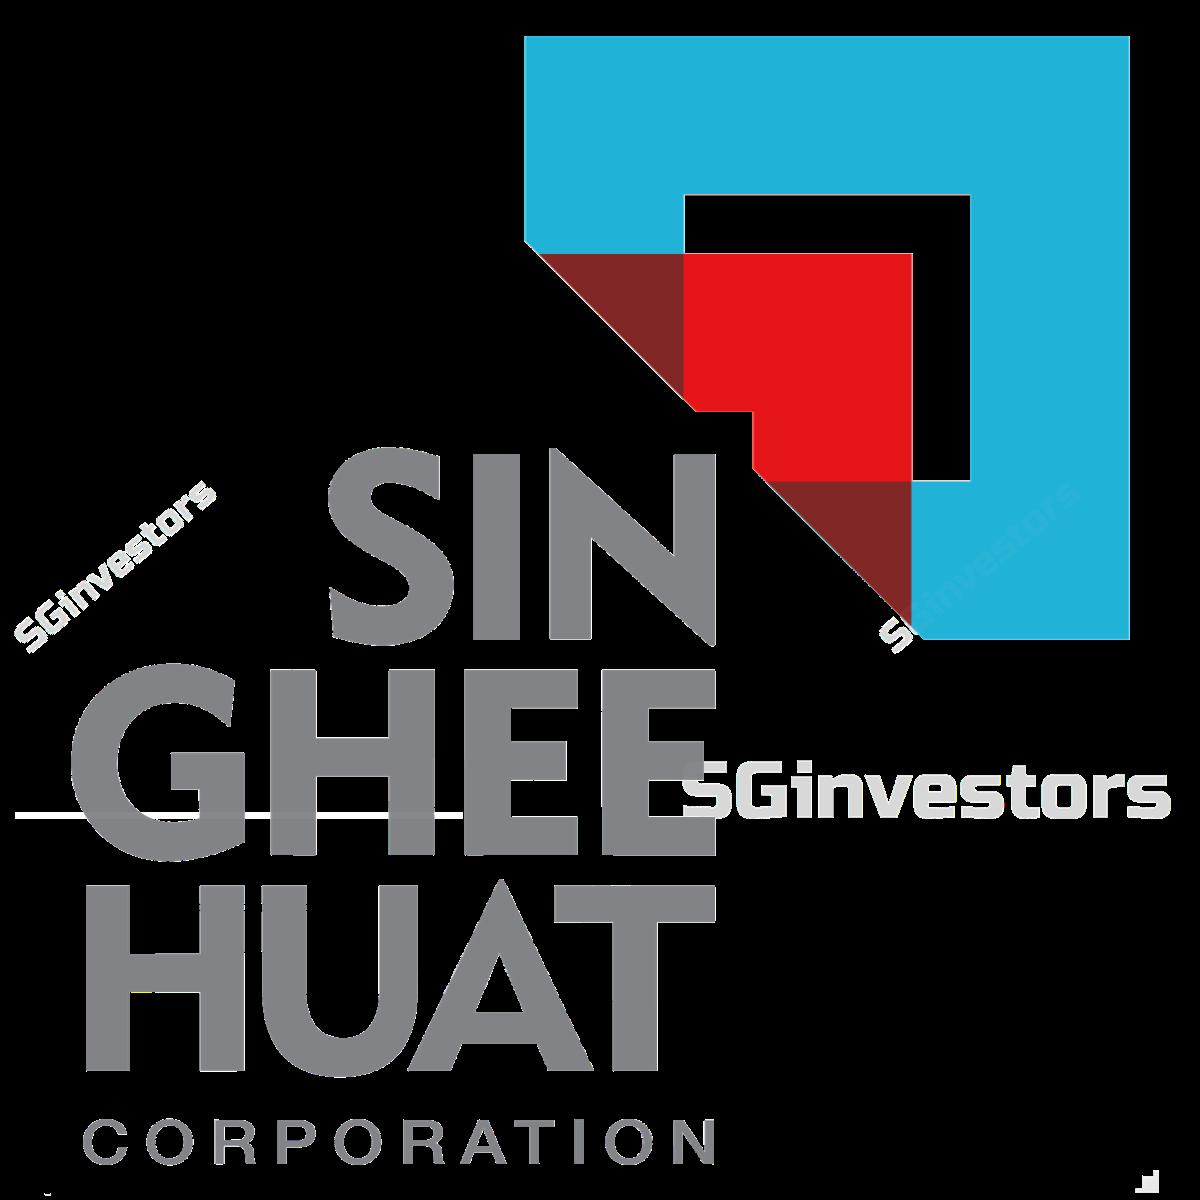 SIN GHEE HUAT CORPORATION LTD. (SGX:B7K) @ SGinvestors.io